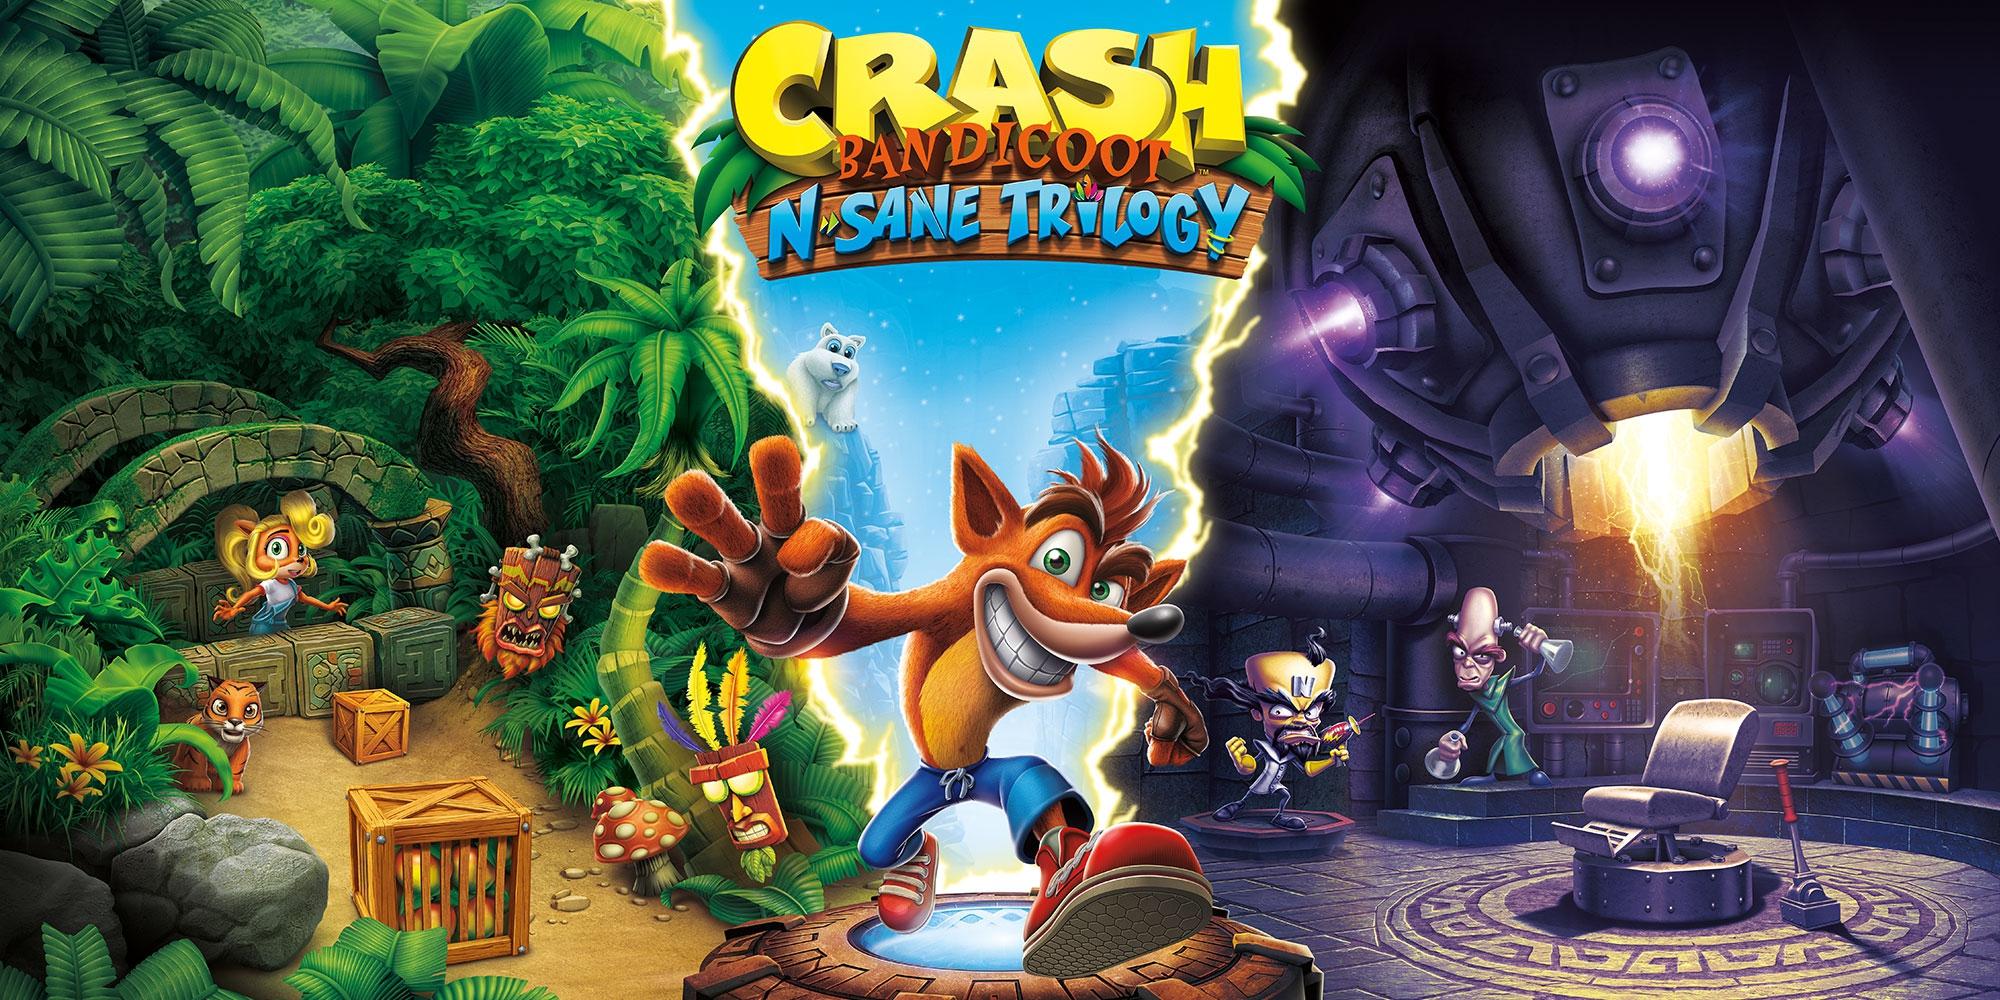 Crash Bandicoot N.Sane Trilogy a quota 10 milioni